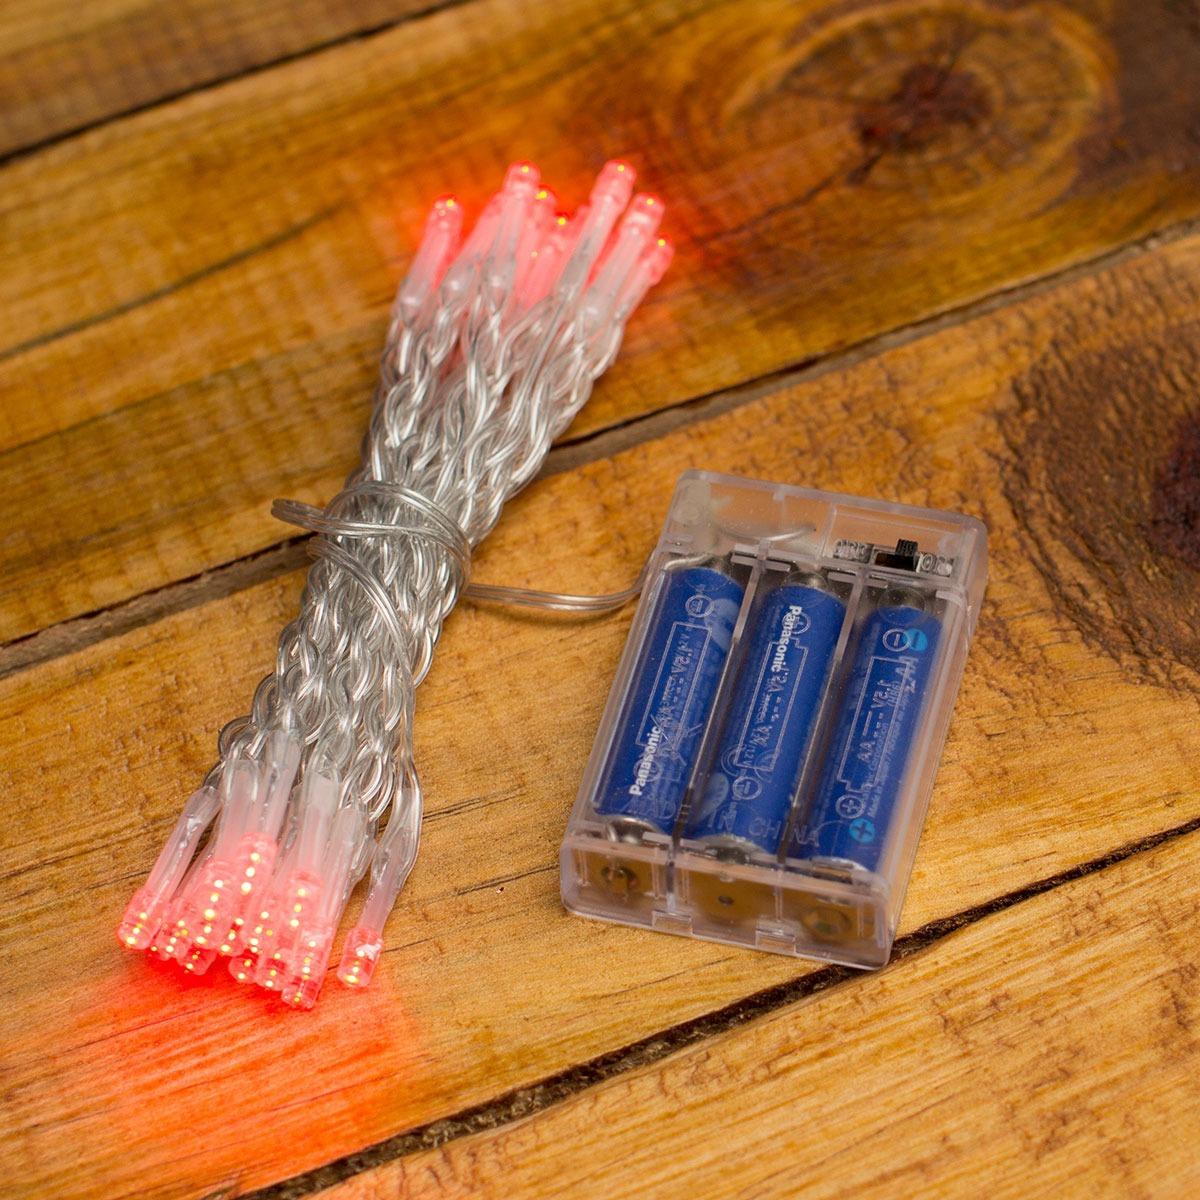 4d4d5eff9d3 serie luces navidad con 30 led 3mt pilas foquitos baterias. Cargando zoom.